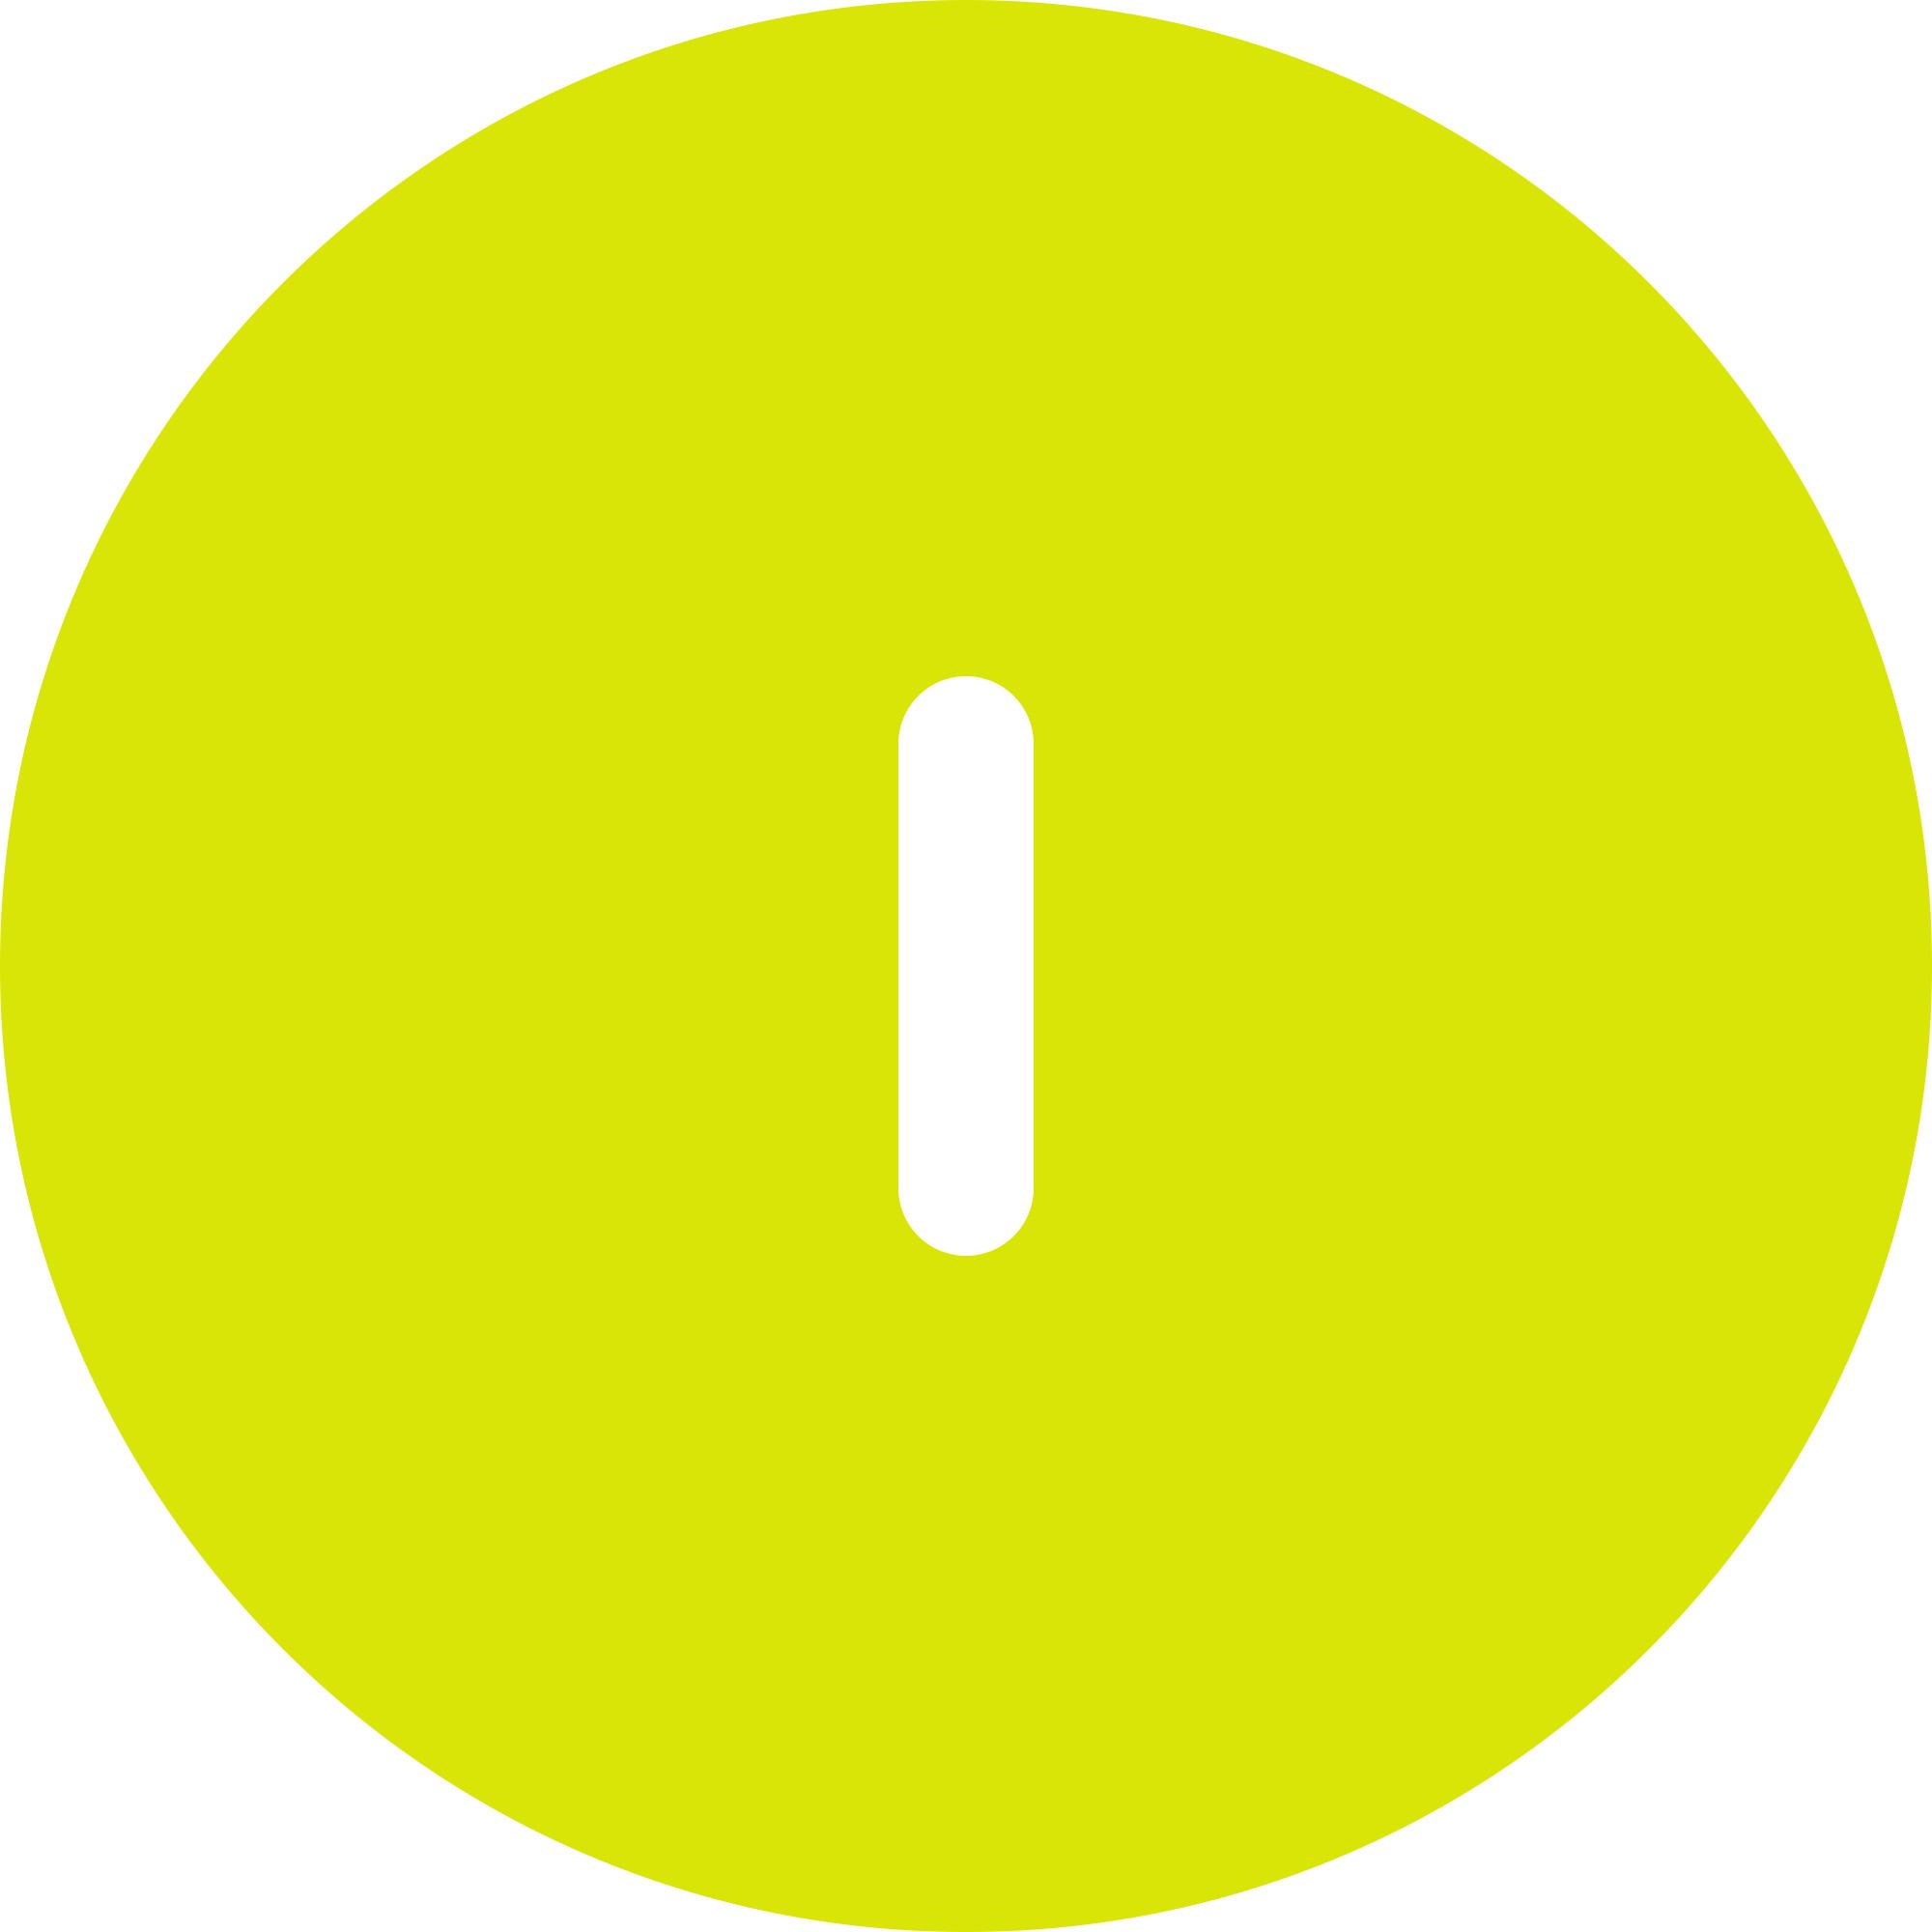 01-news-bundespreis-ecodesign